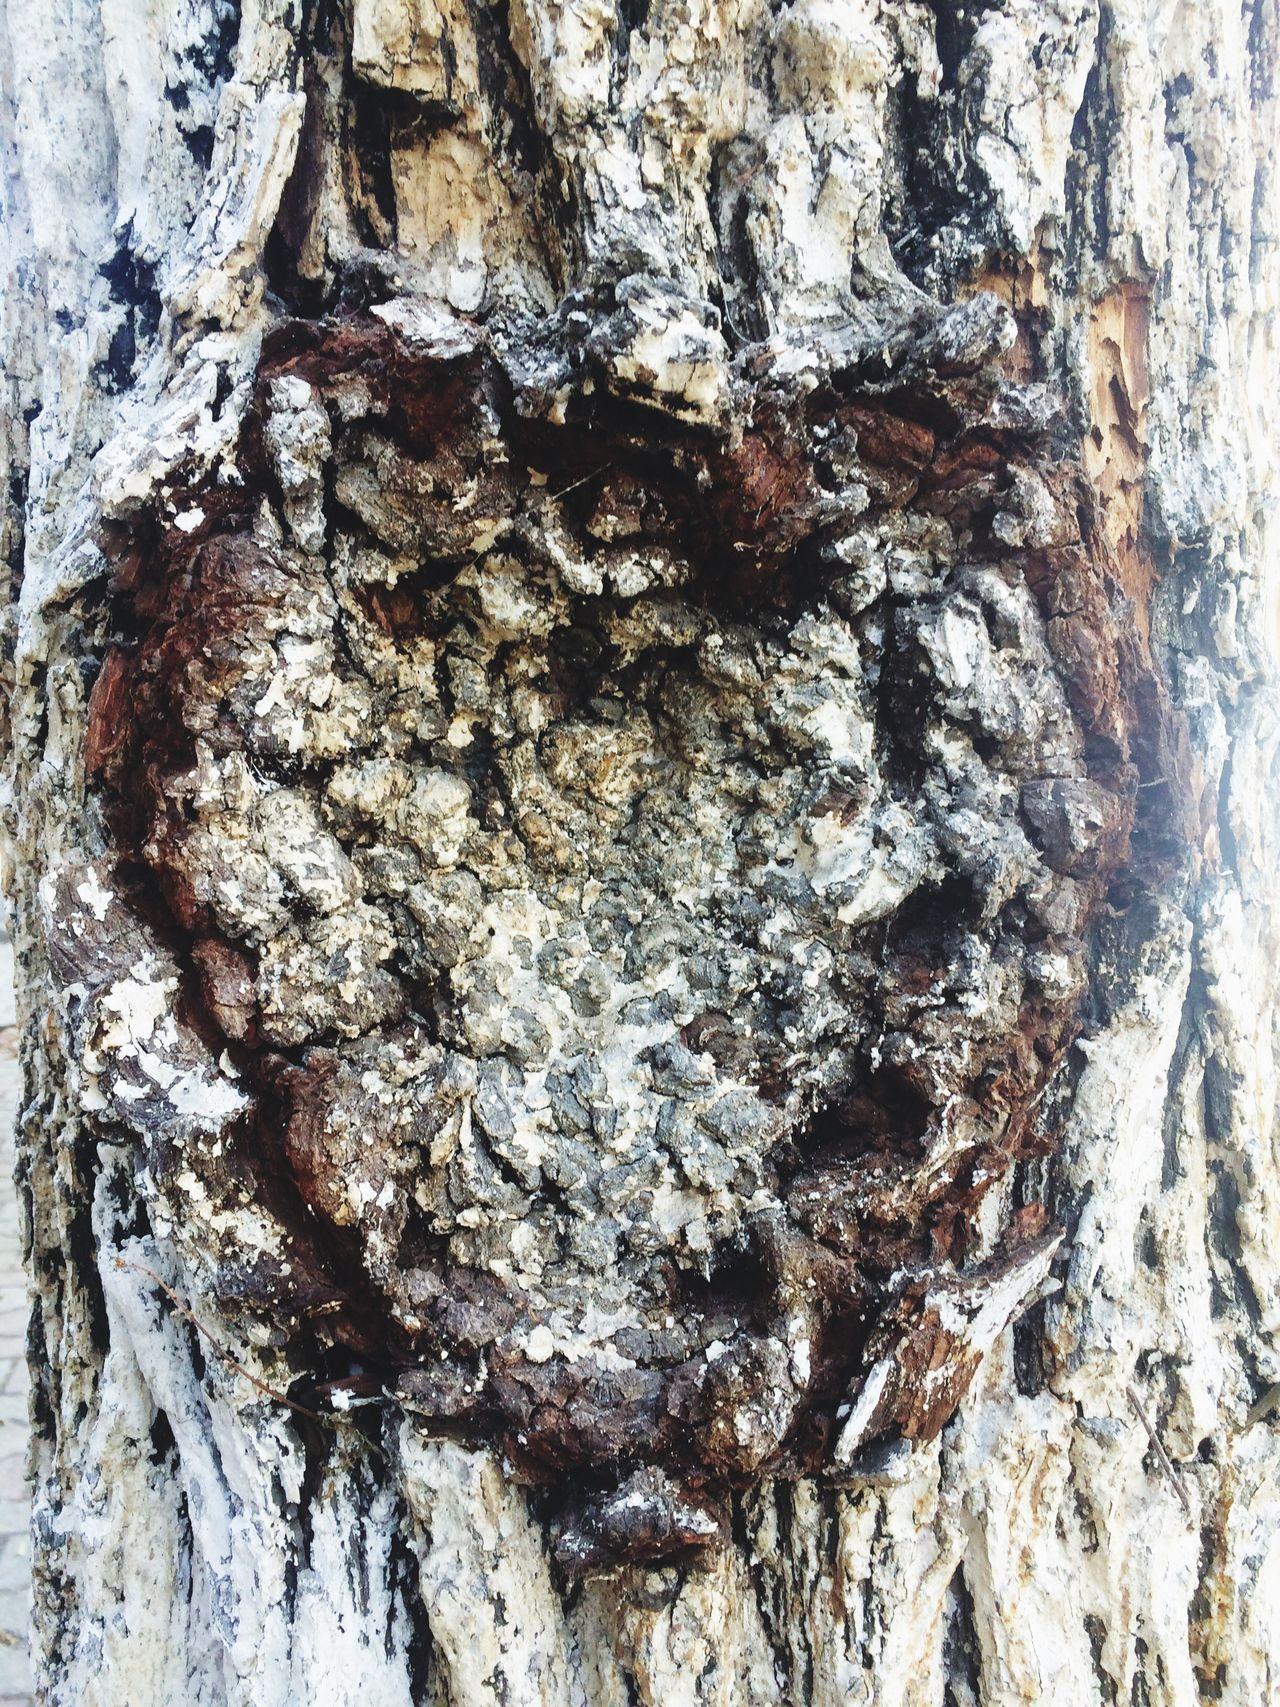 Heart Shape Heart Heart Shapes In Nature Carved In Wood Carved On Tree Carved Heart Carved Heart In Treebark Love Popular